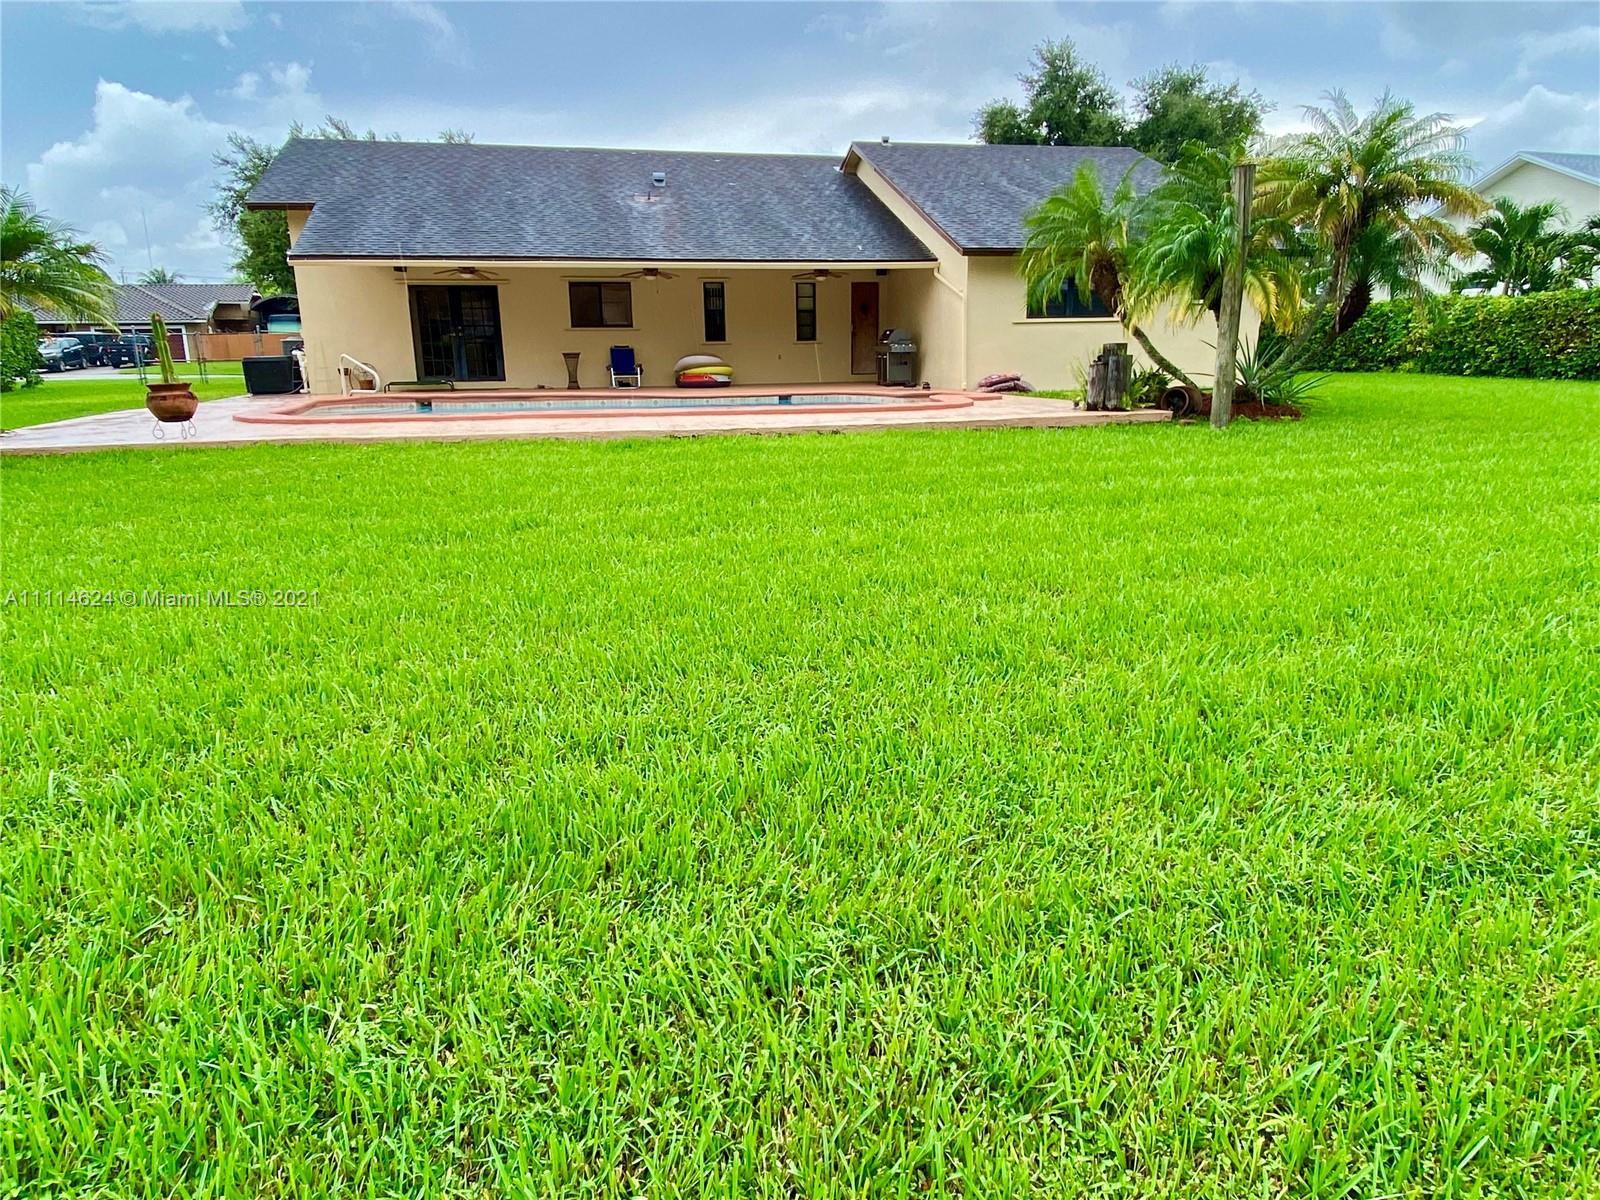 Single Family Home For Sale REDLANDS MANSIONS,Redland Mansions1,840 Sq